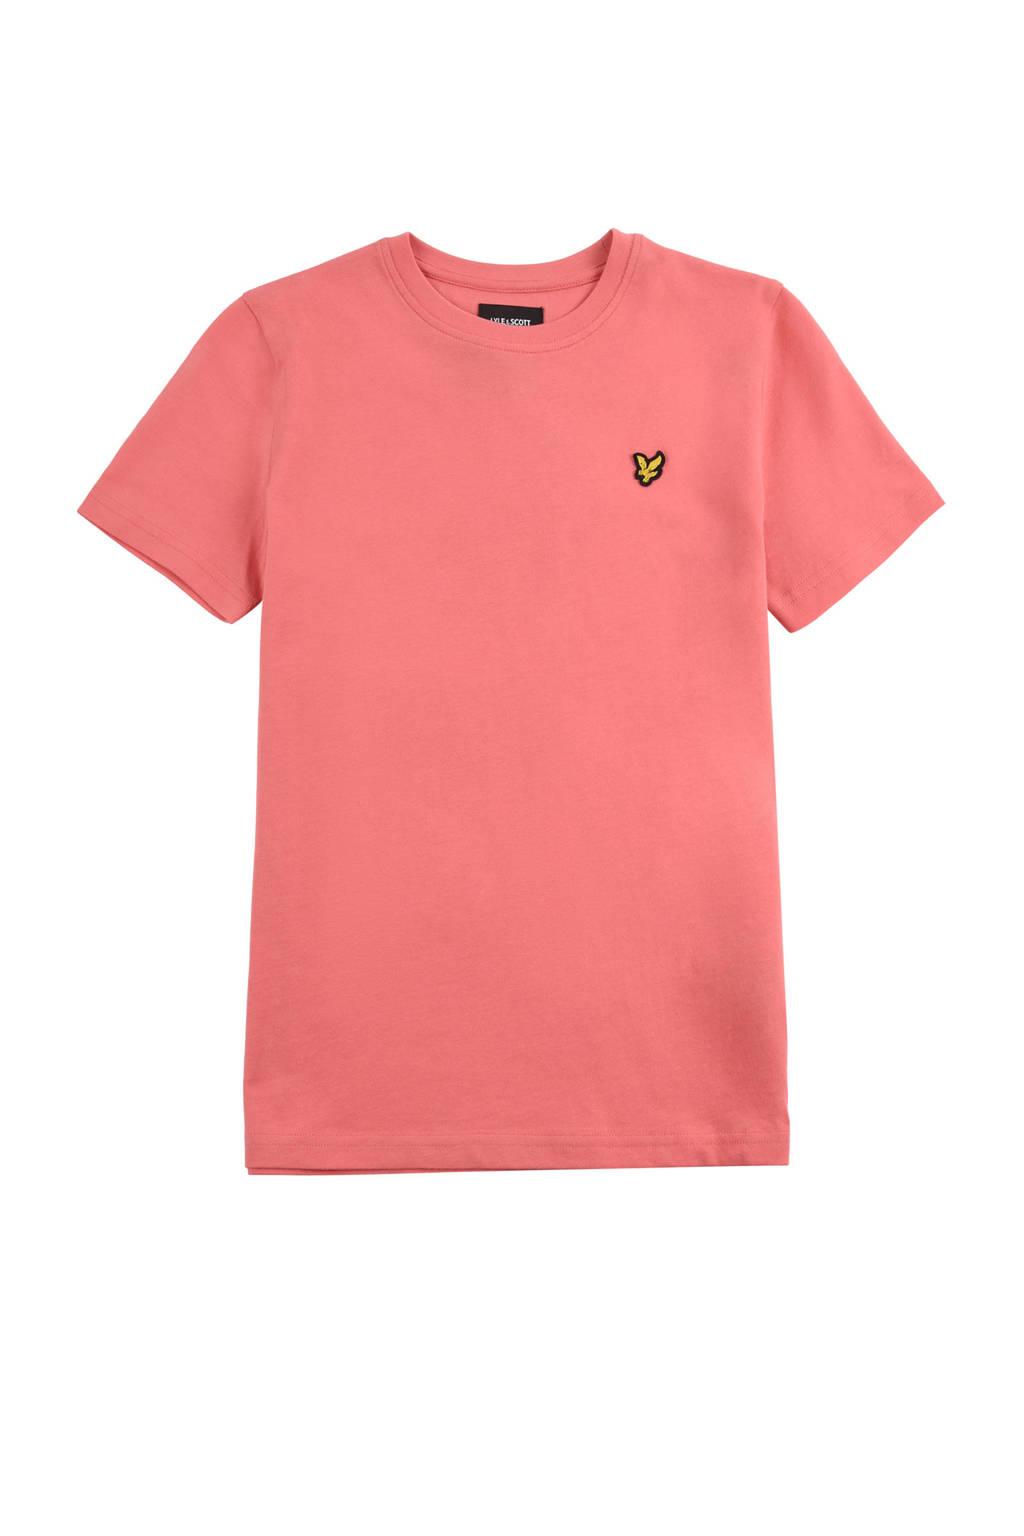 Lyle & Scott T-shirt roze, Roze